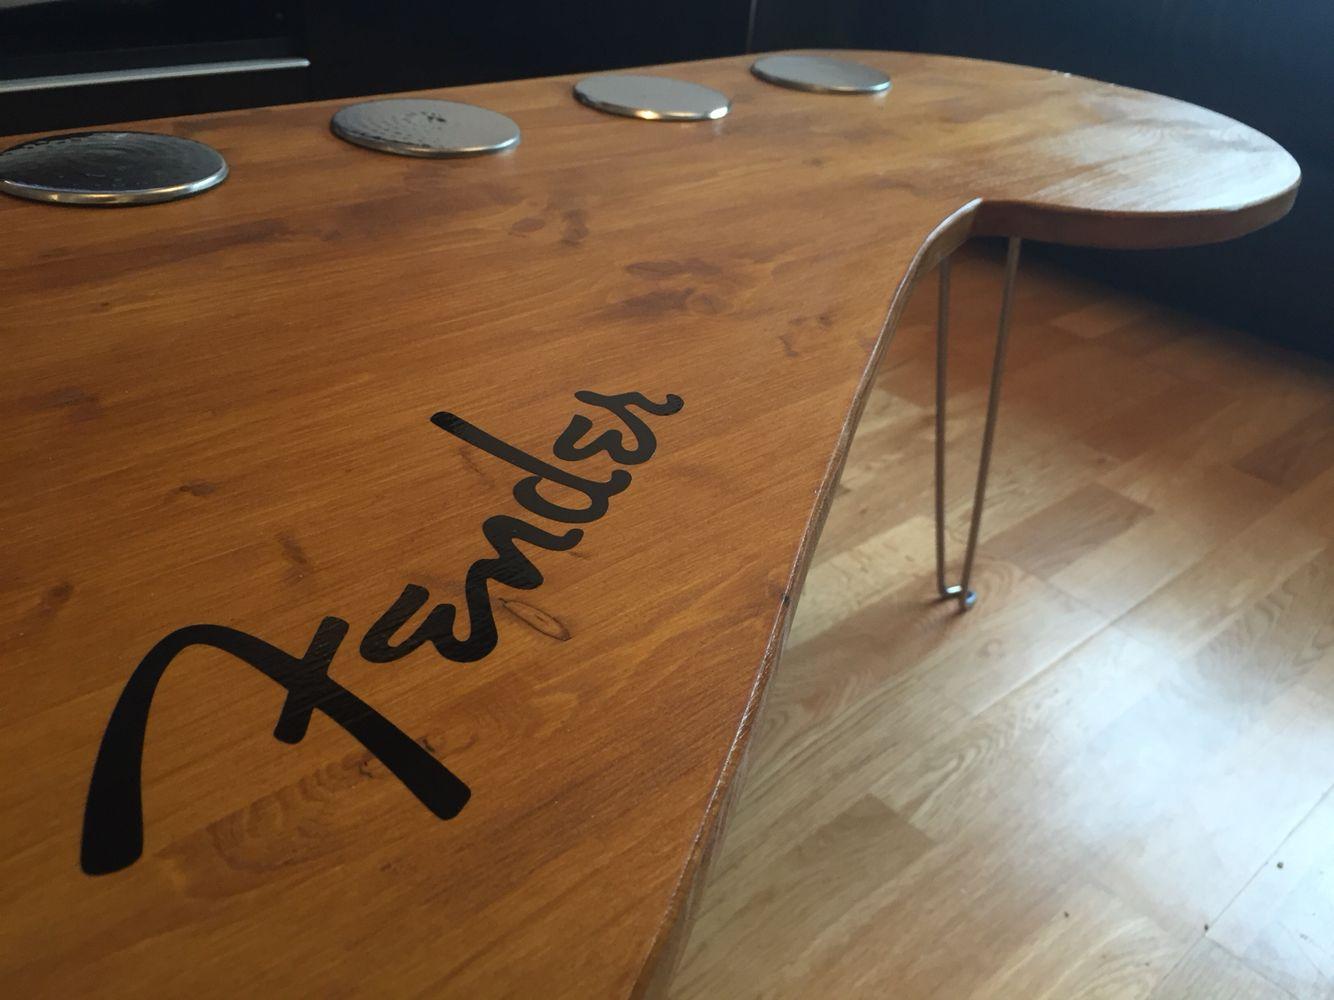 fender coffee table fender guitar coffee table in 2019 fender guitars table fender. Black Bedroom Furniture Sets. Home Design Ideas